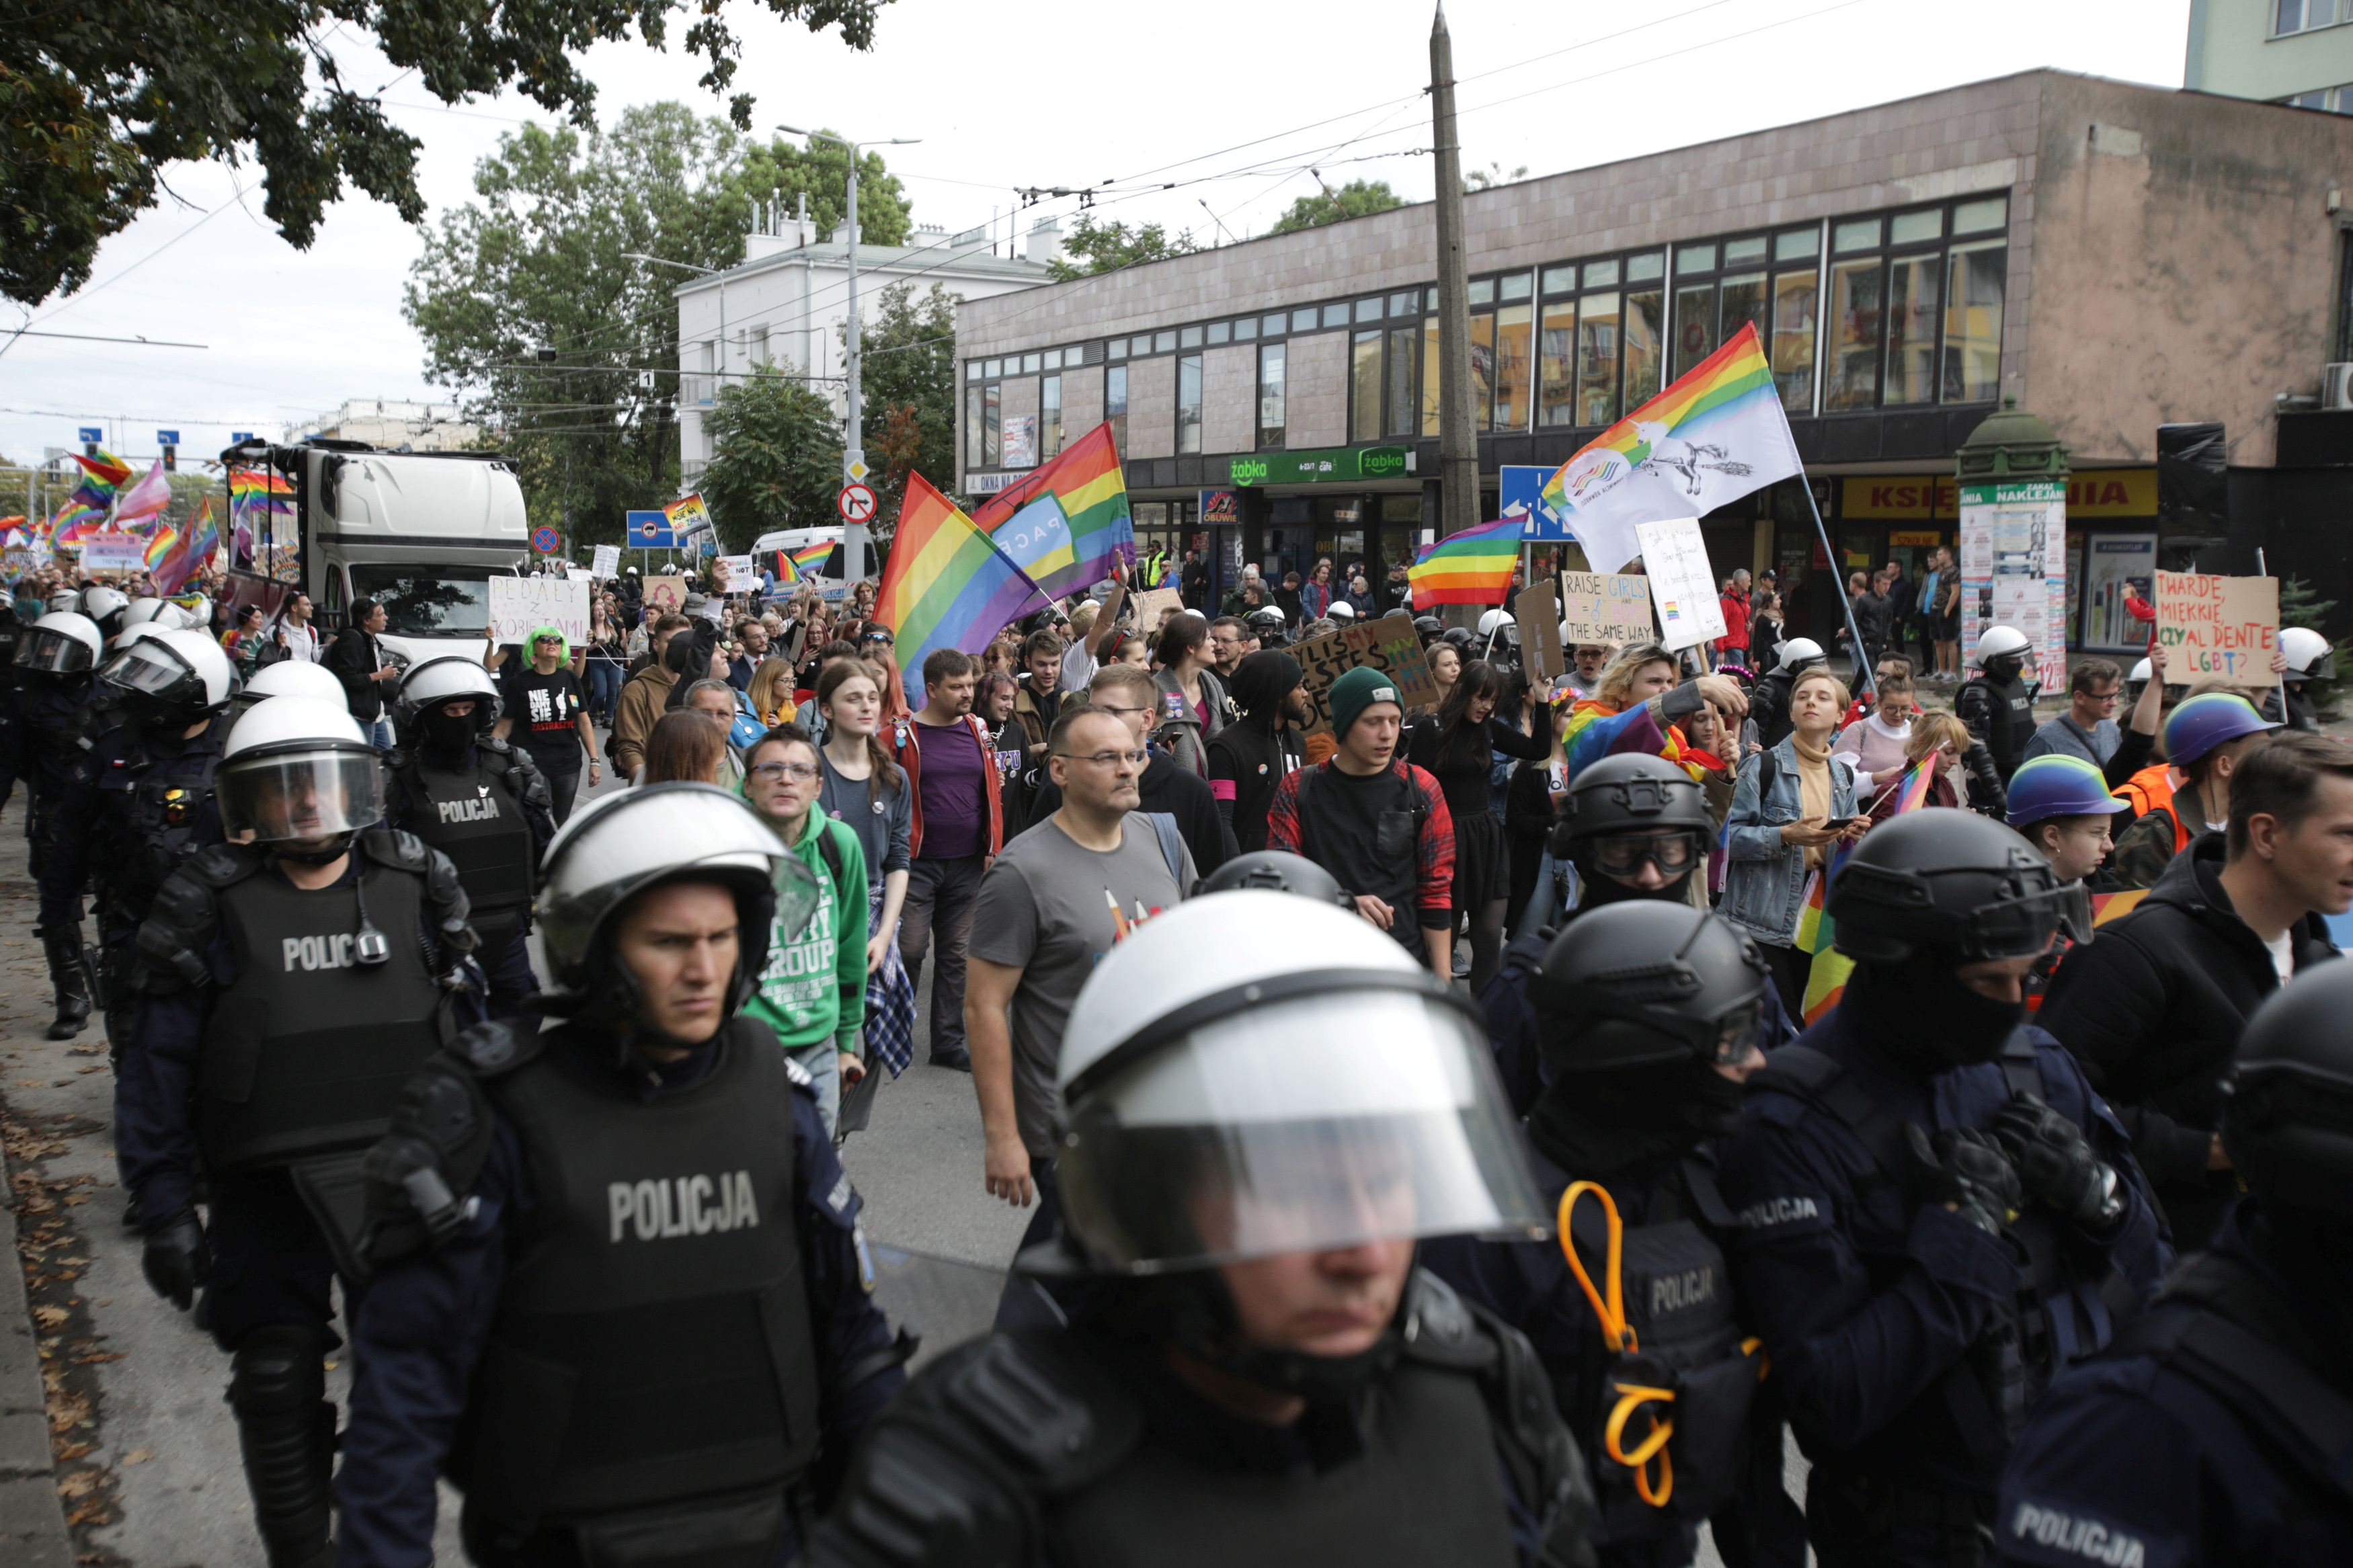 Gay Pride στην Πολωνία συνοδεία αστυνομικών δυνάμεων - Προστάτευσαν τους συμμετέχοντες από επίθεση ακροδεξιών